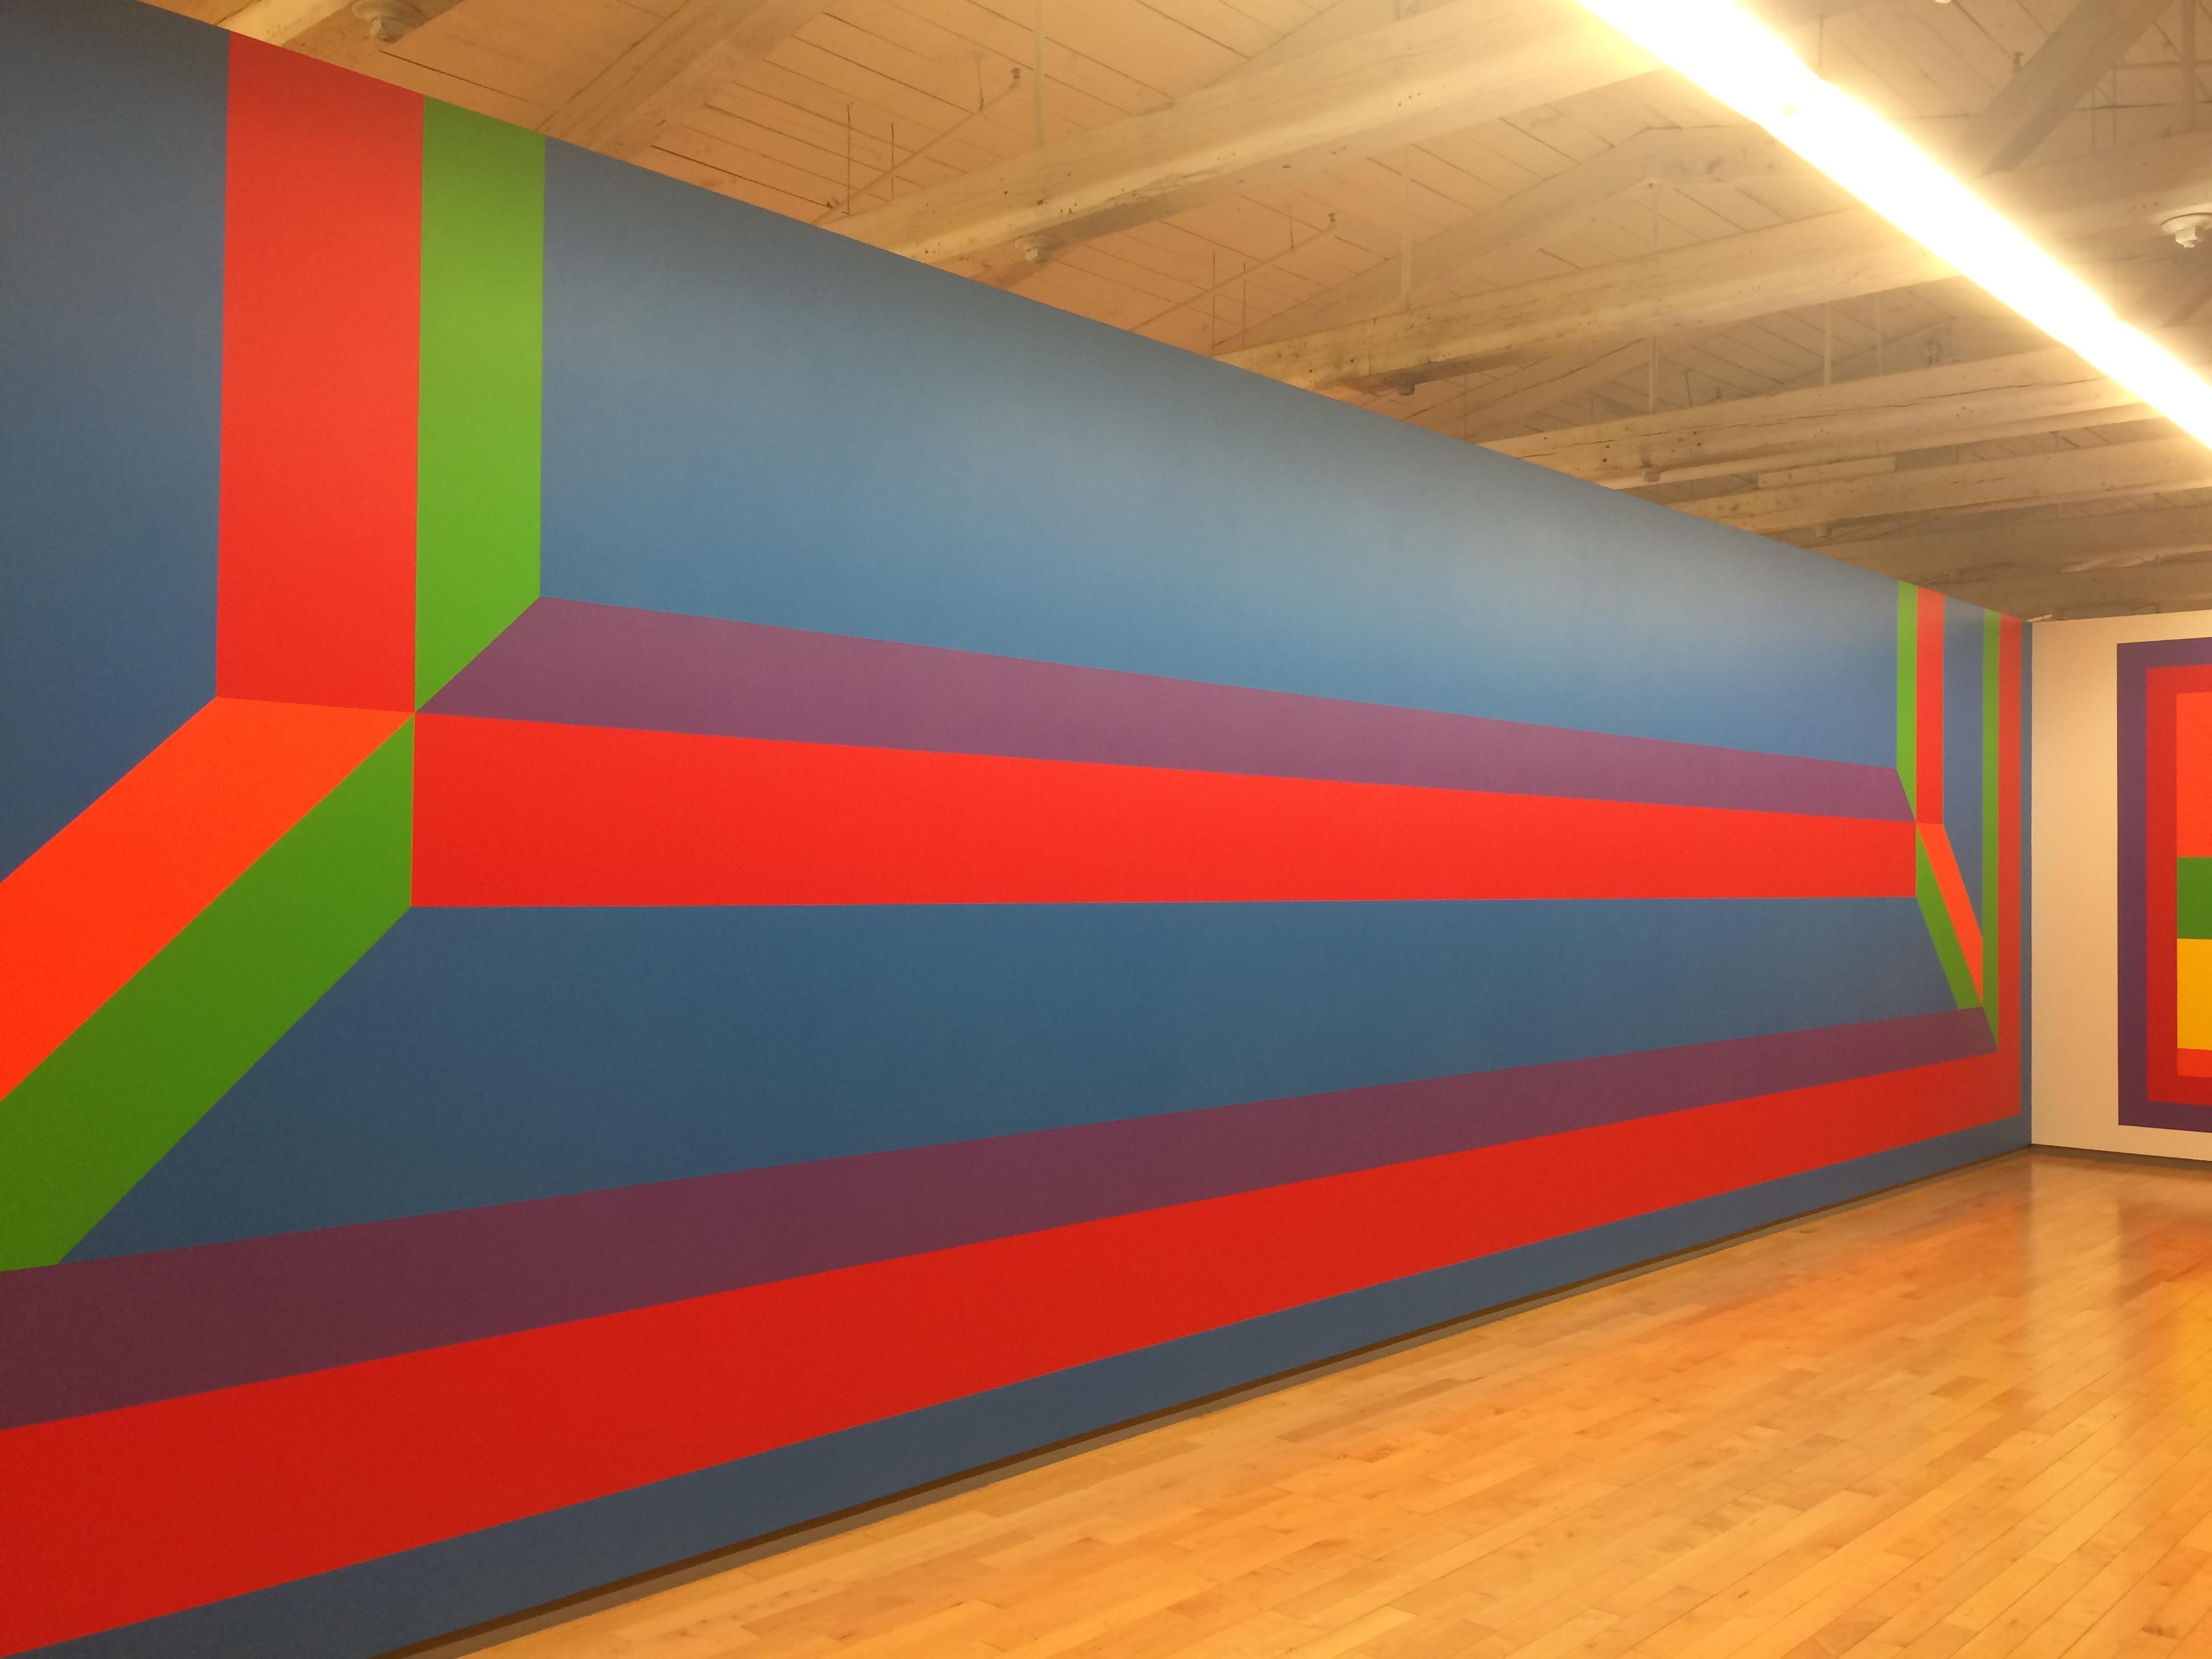 Exhibition Sol Lewitt At Mass Moca Part One Color The Responsive I